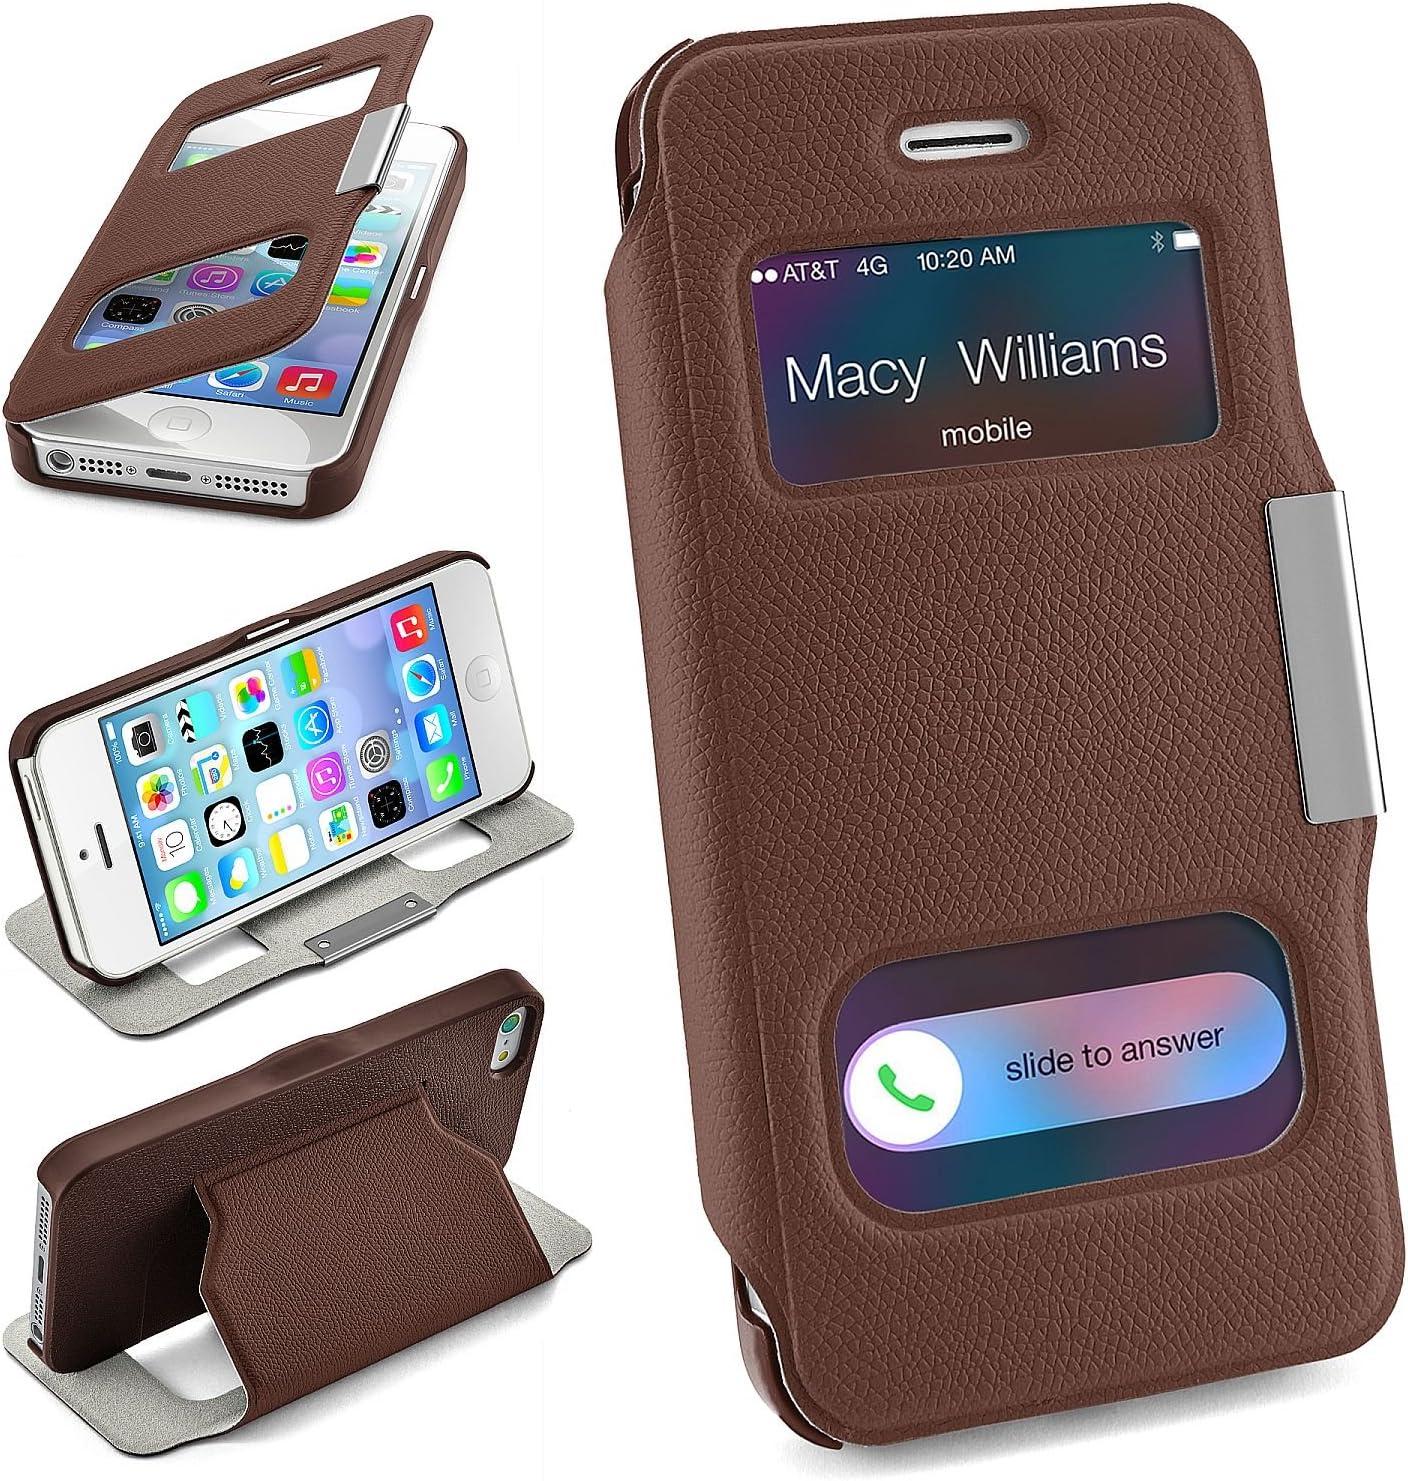 MoEx Bolso OneFlow para Funda iPhone 5 / 5S / SE Cubierta con Ventana   Estuche Flip Case Funda móvil Plegable   Bolso móvil Funda Protectora ...